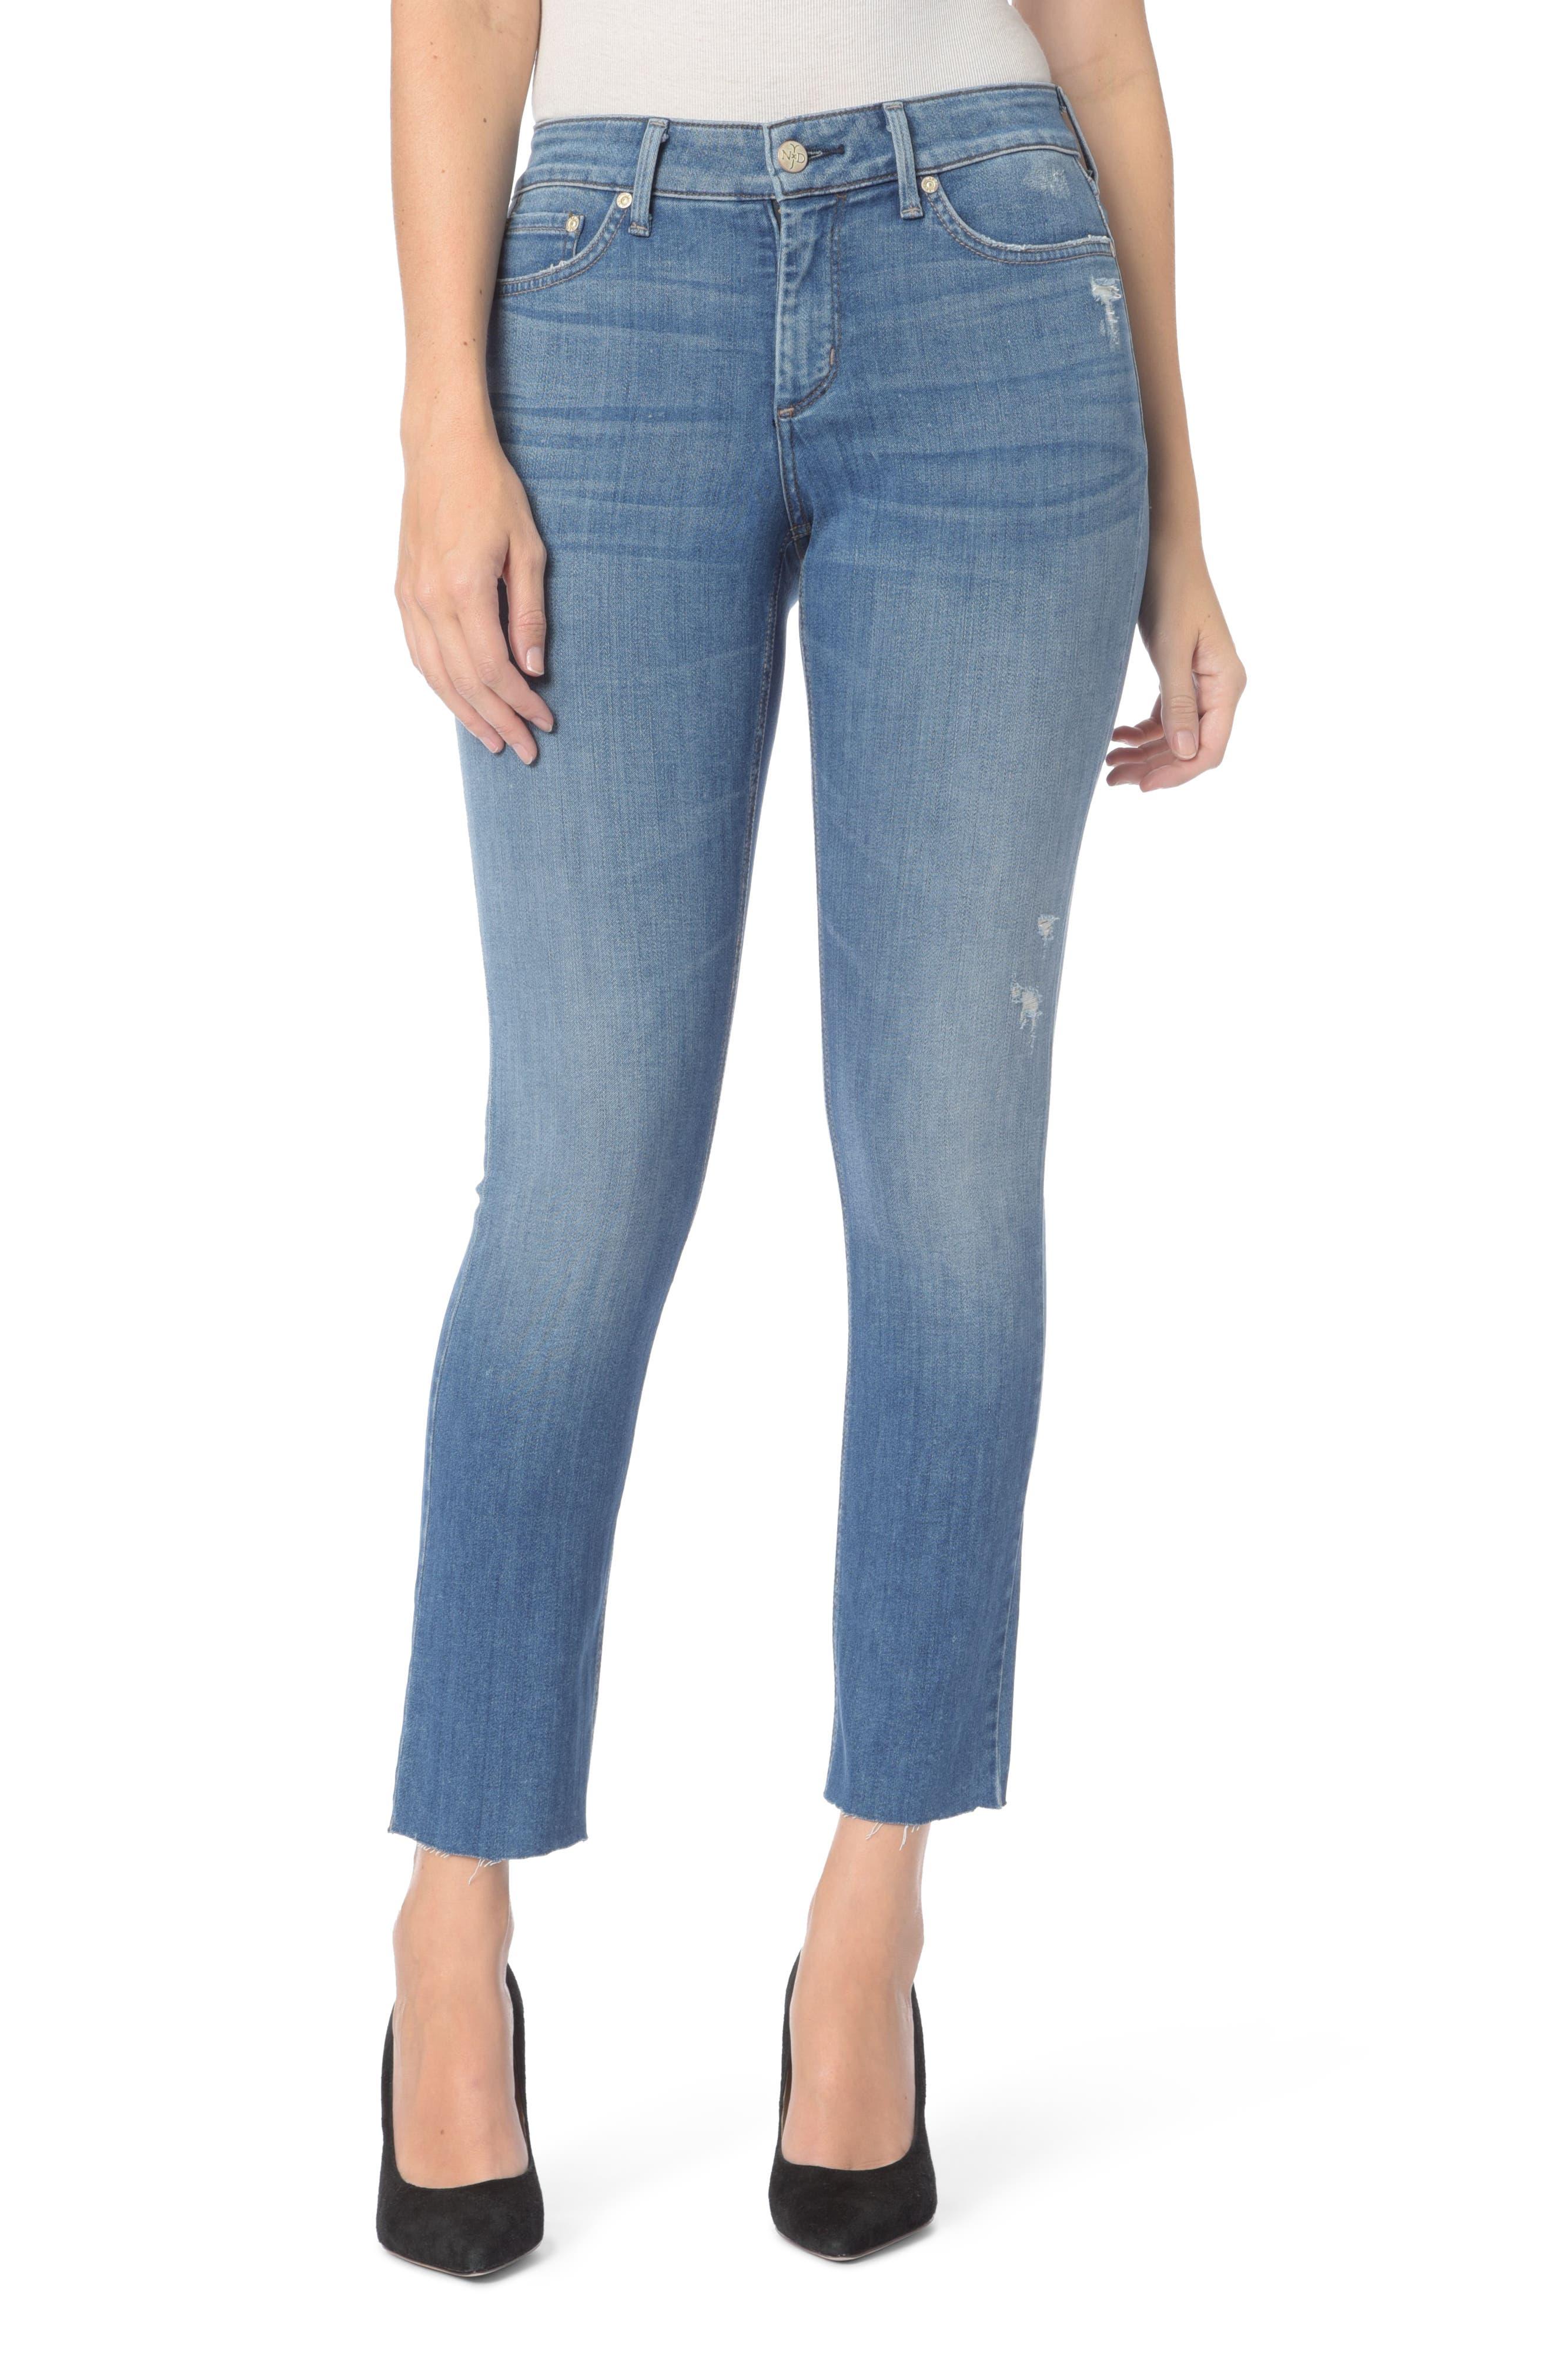 Alternate Image 1 Selected - NYDJ Sheri Ripped Slim Stretch Ankle Jeans (Burton)